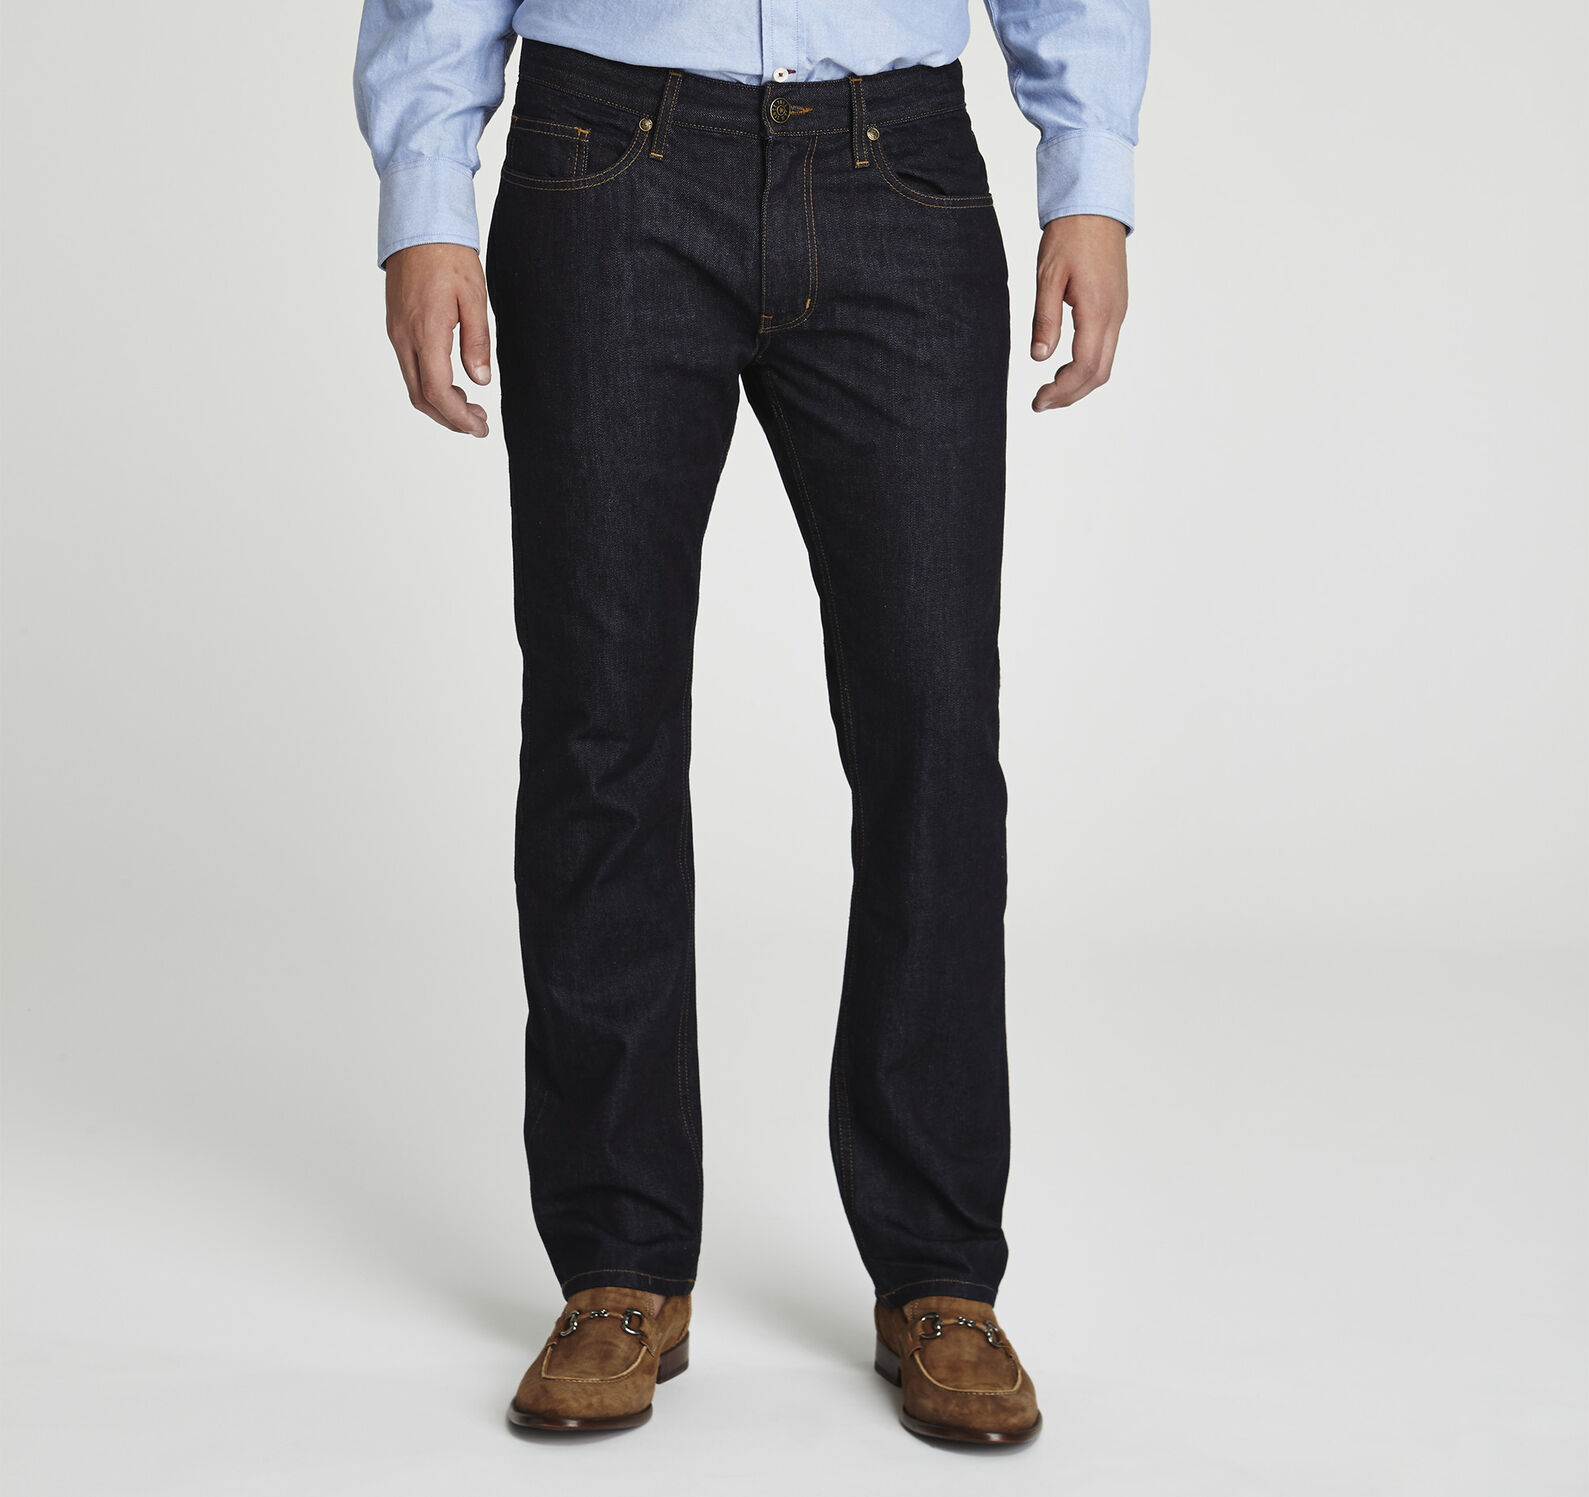 6a58127165 Slim Fit Denim Jeans | Johnston & Murphy